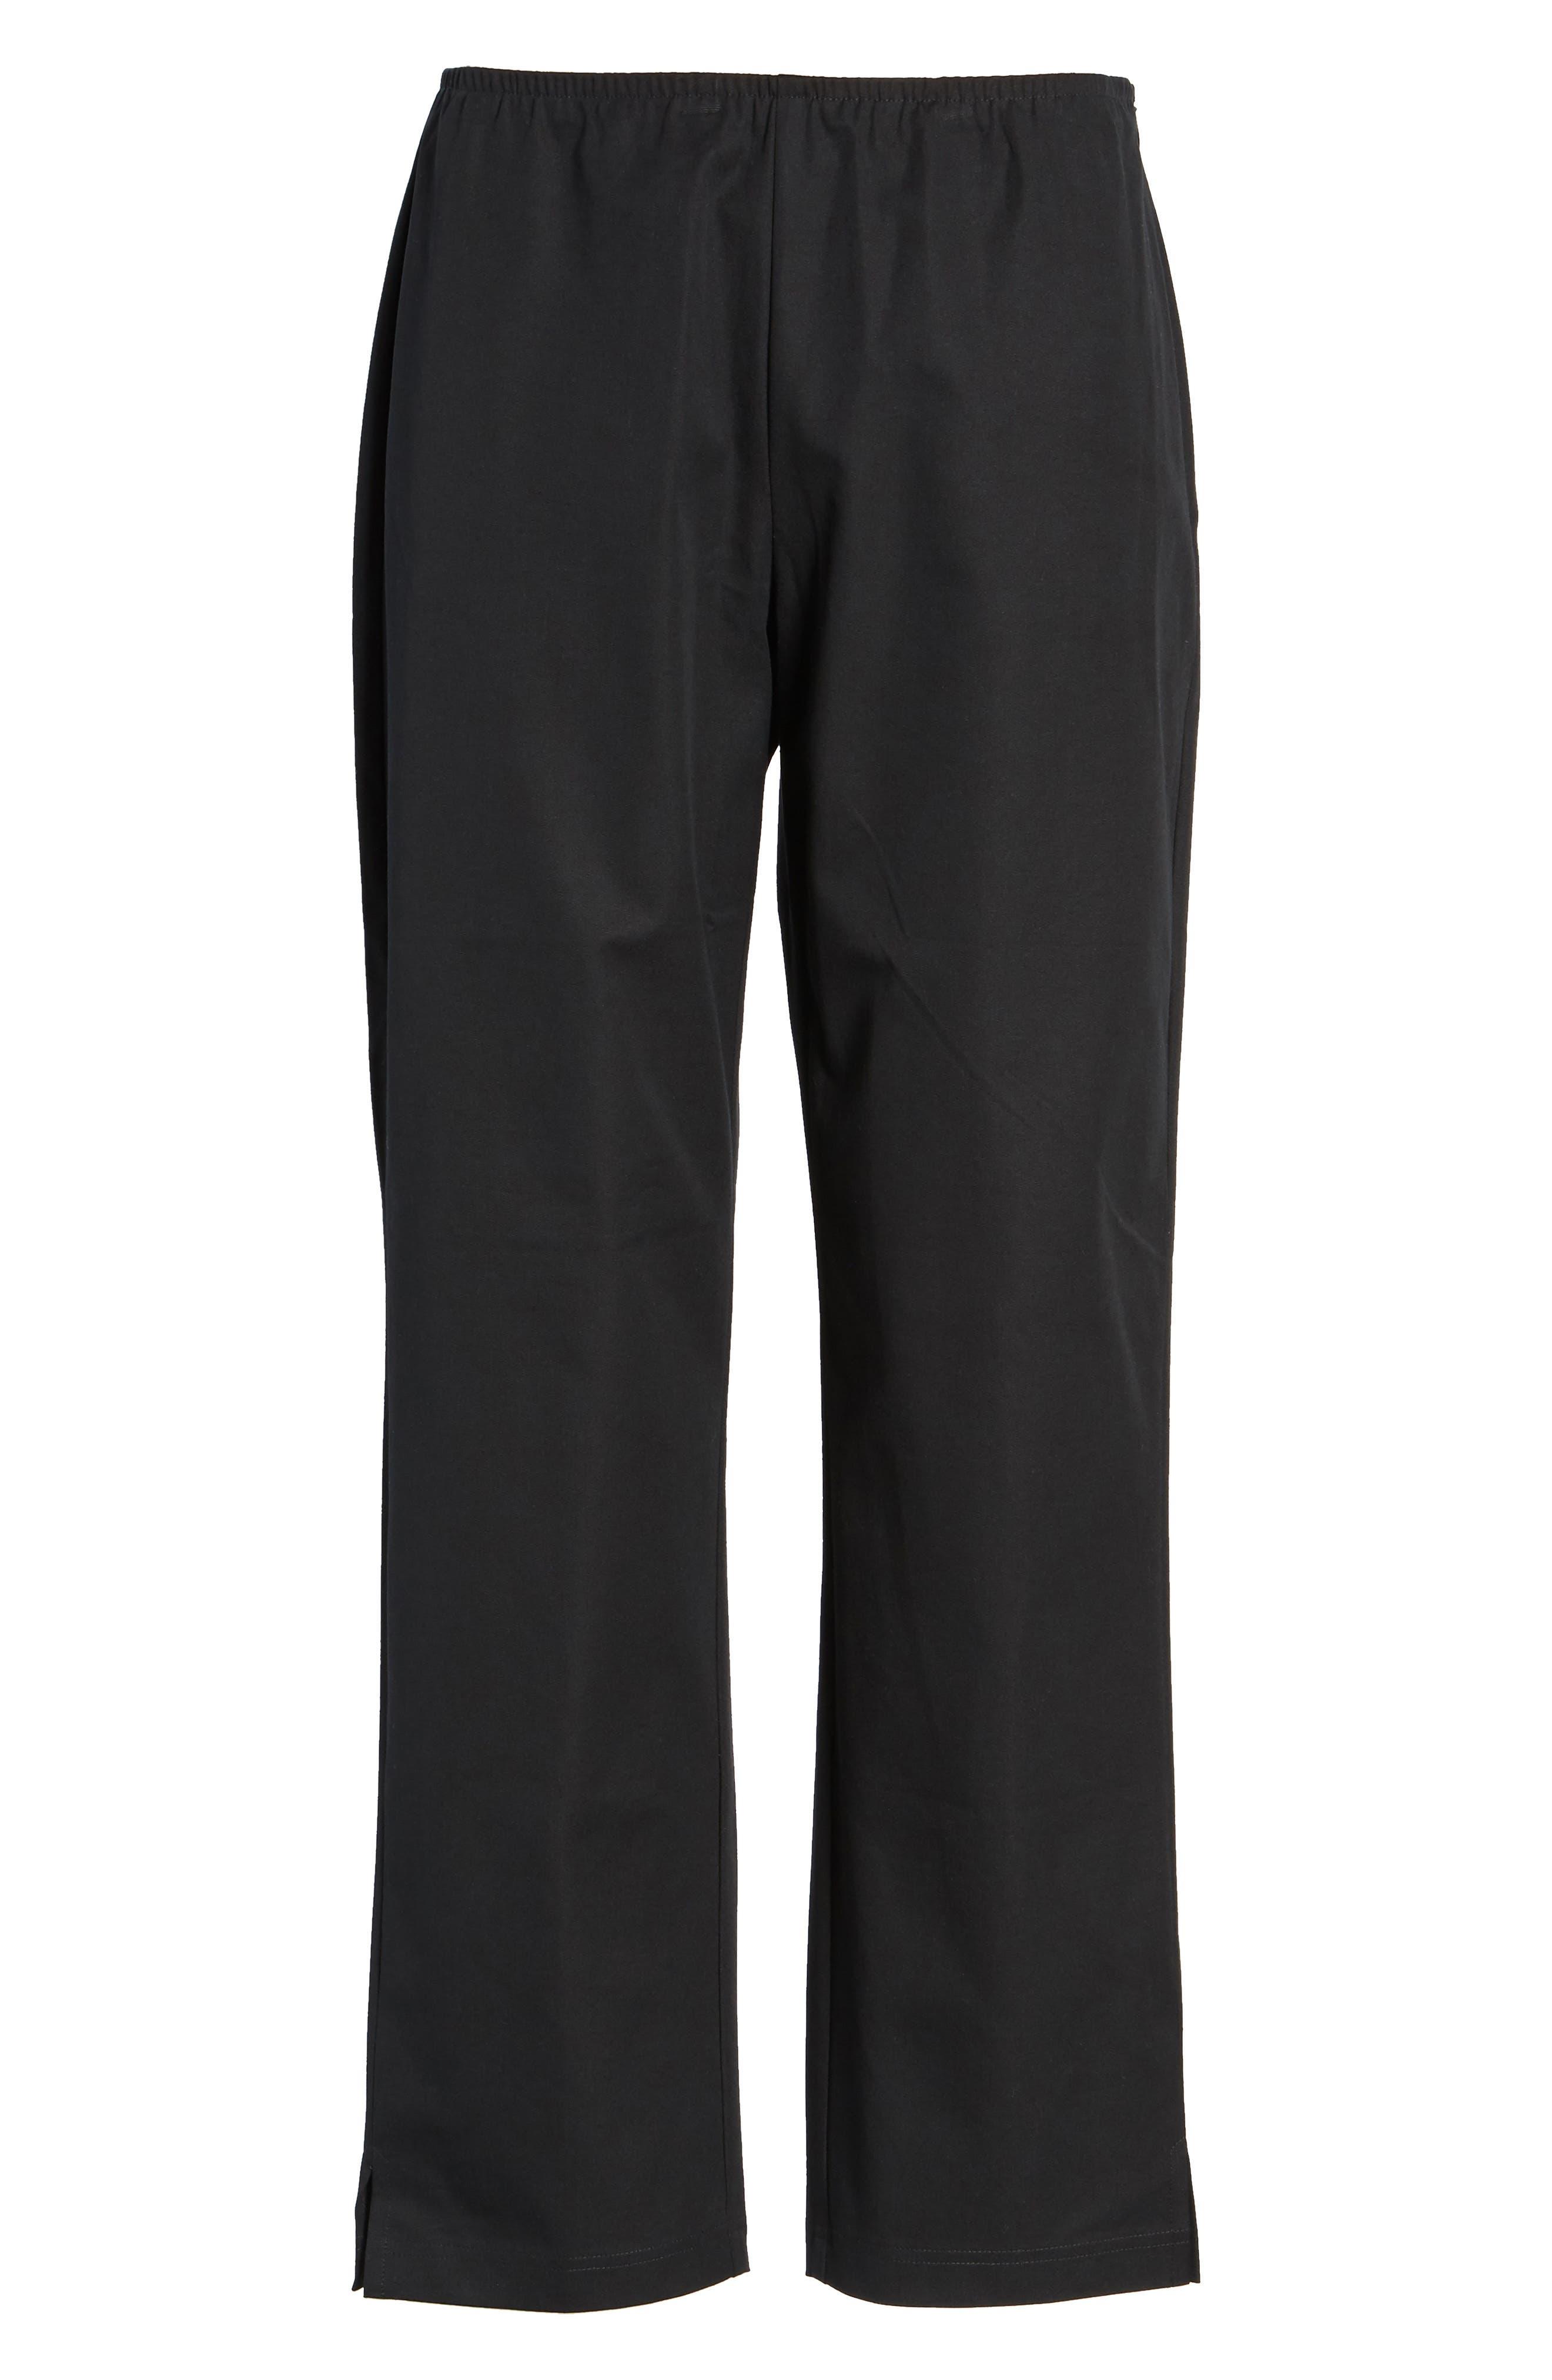 Alternate Image 3  - Eileen Fisher Organic Stretch Cotton Twill Ankle Pants (Regular & Petite)